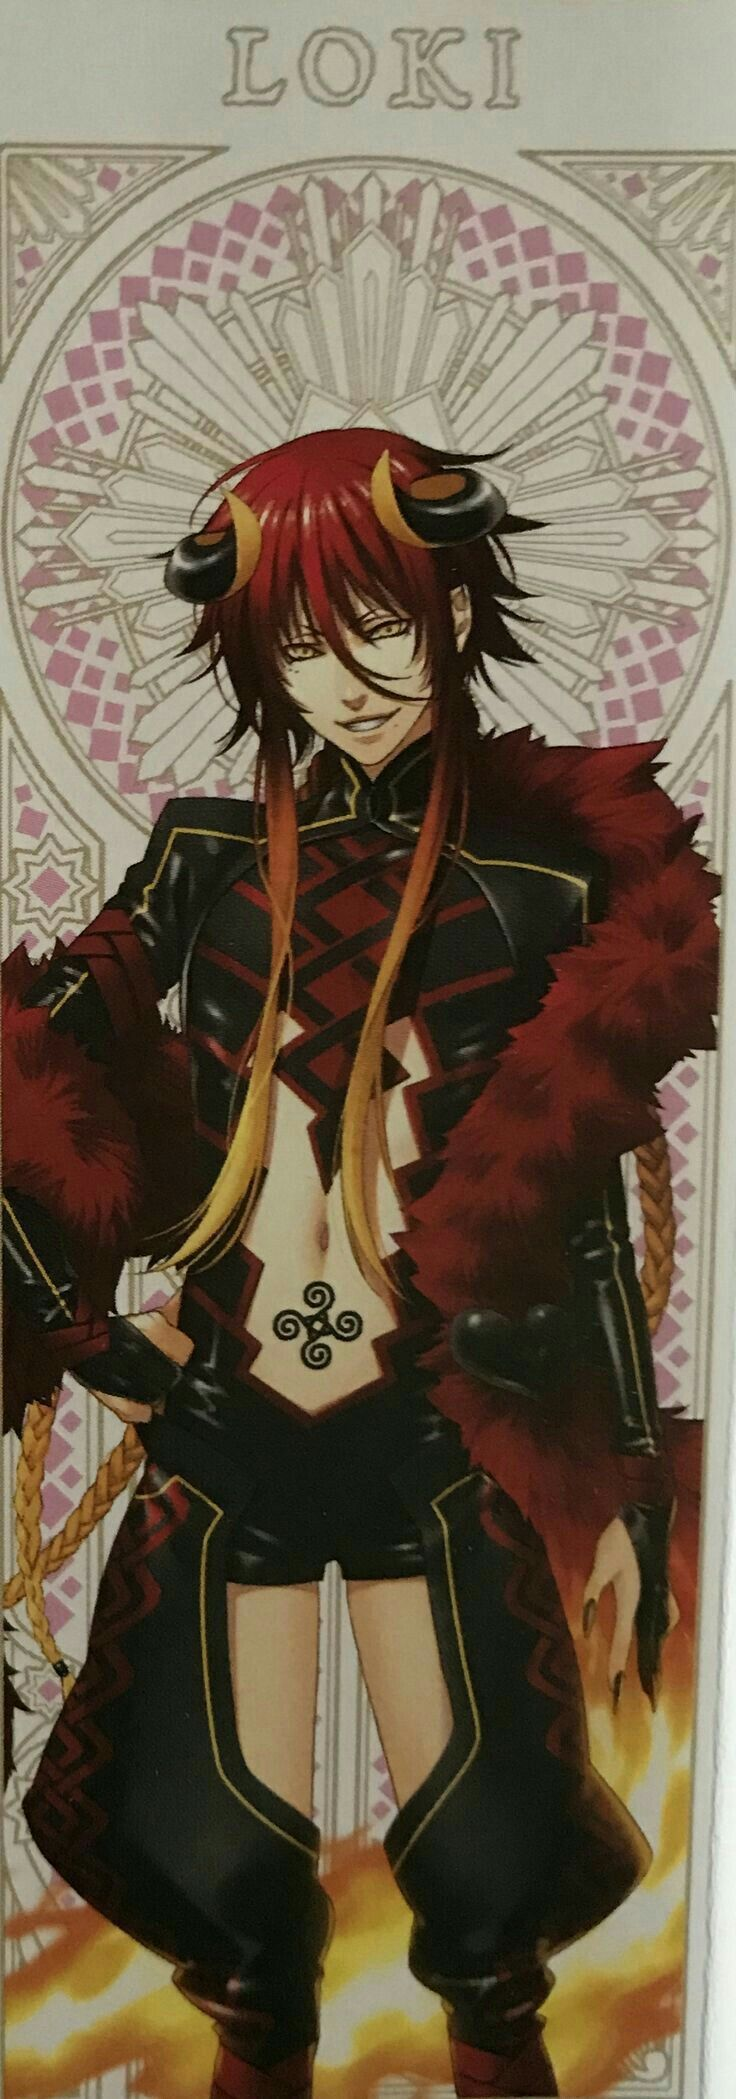 Loki Laevatein, God form, Kamigami No Asobi   STUFF FOR STORIES ...